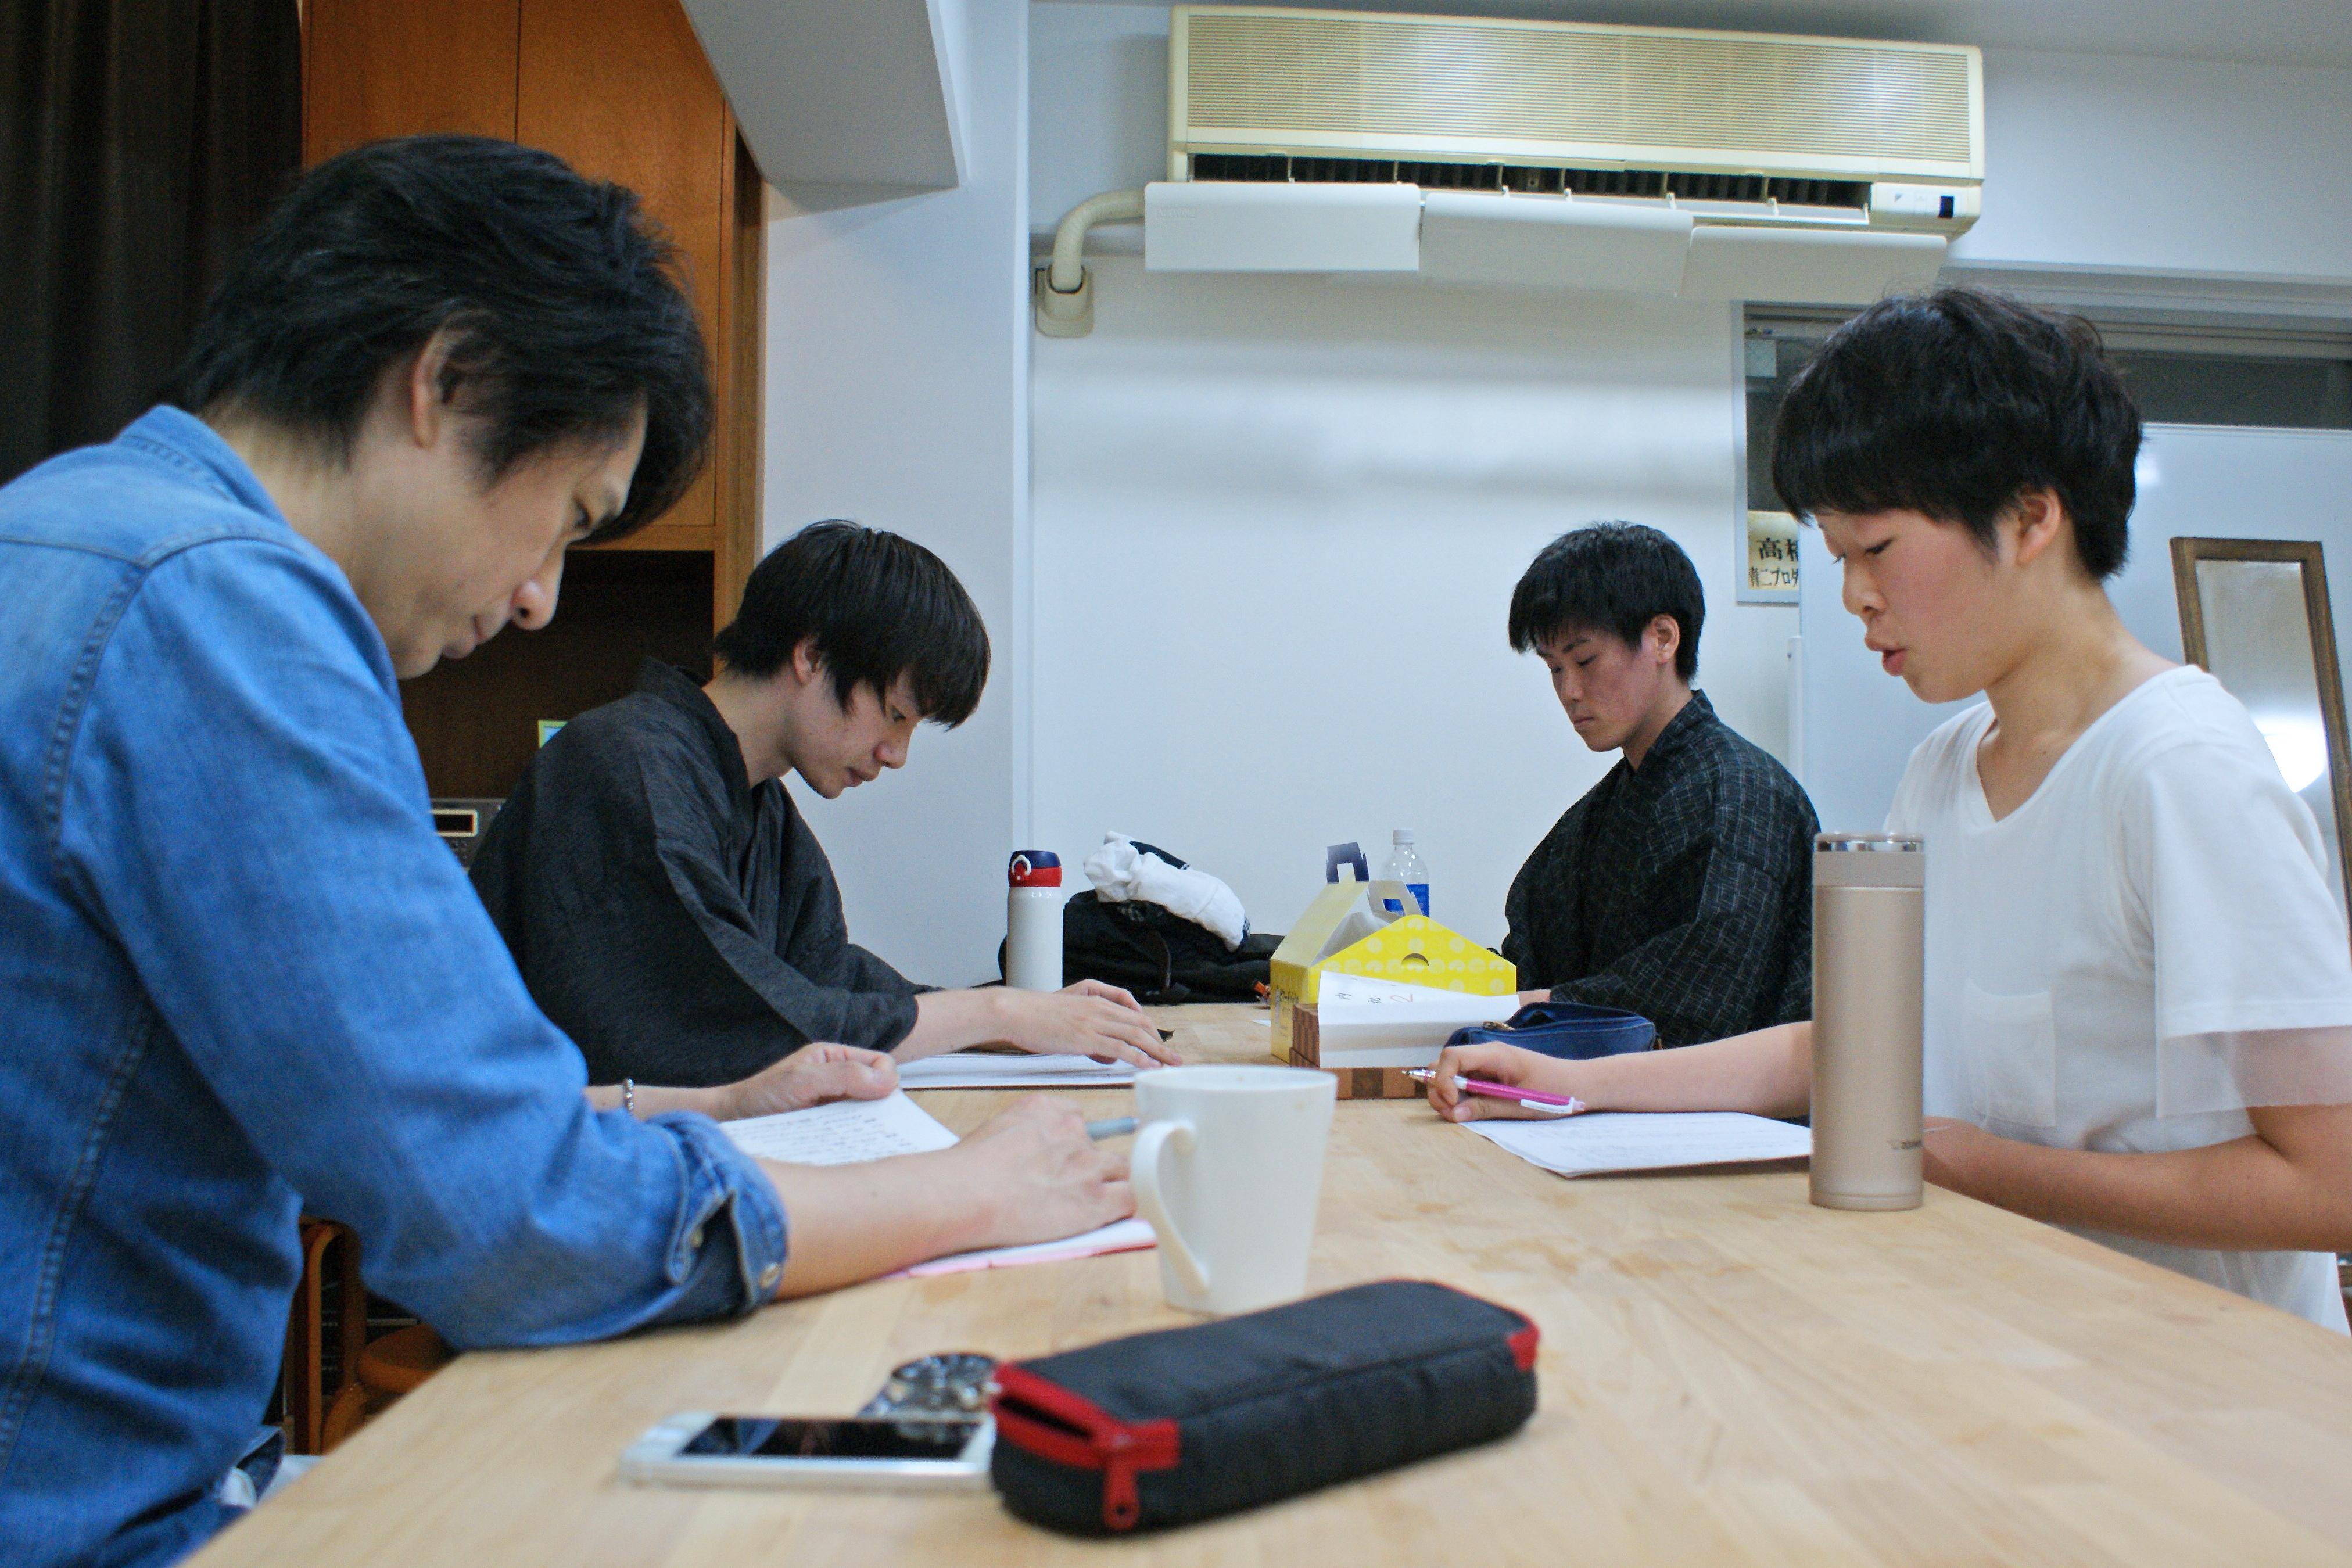 class_honki_yuichiro/